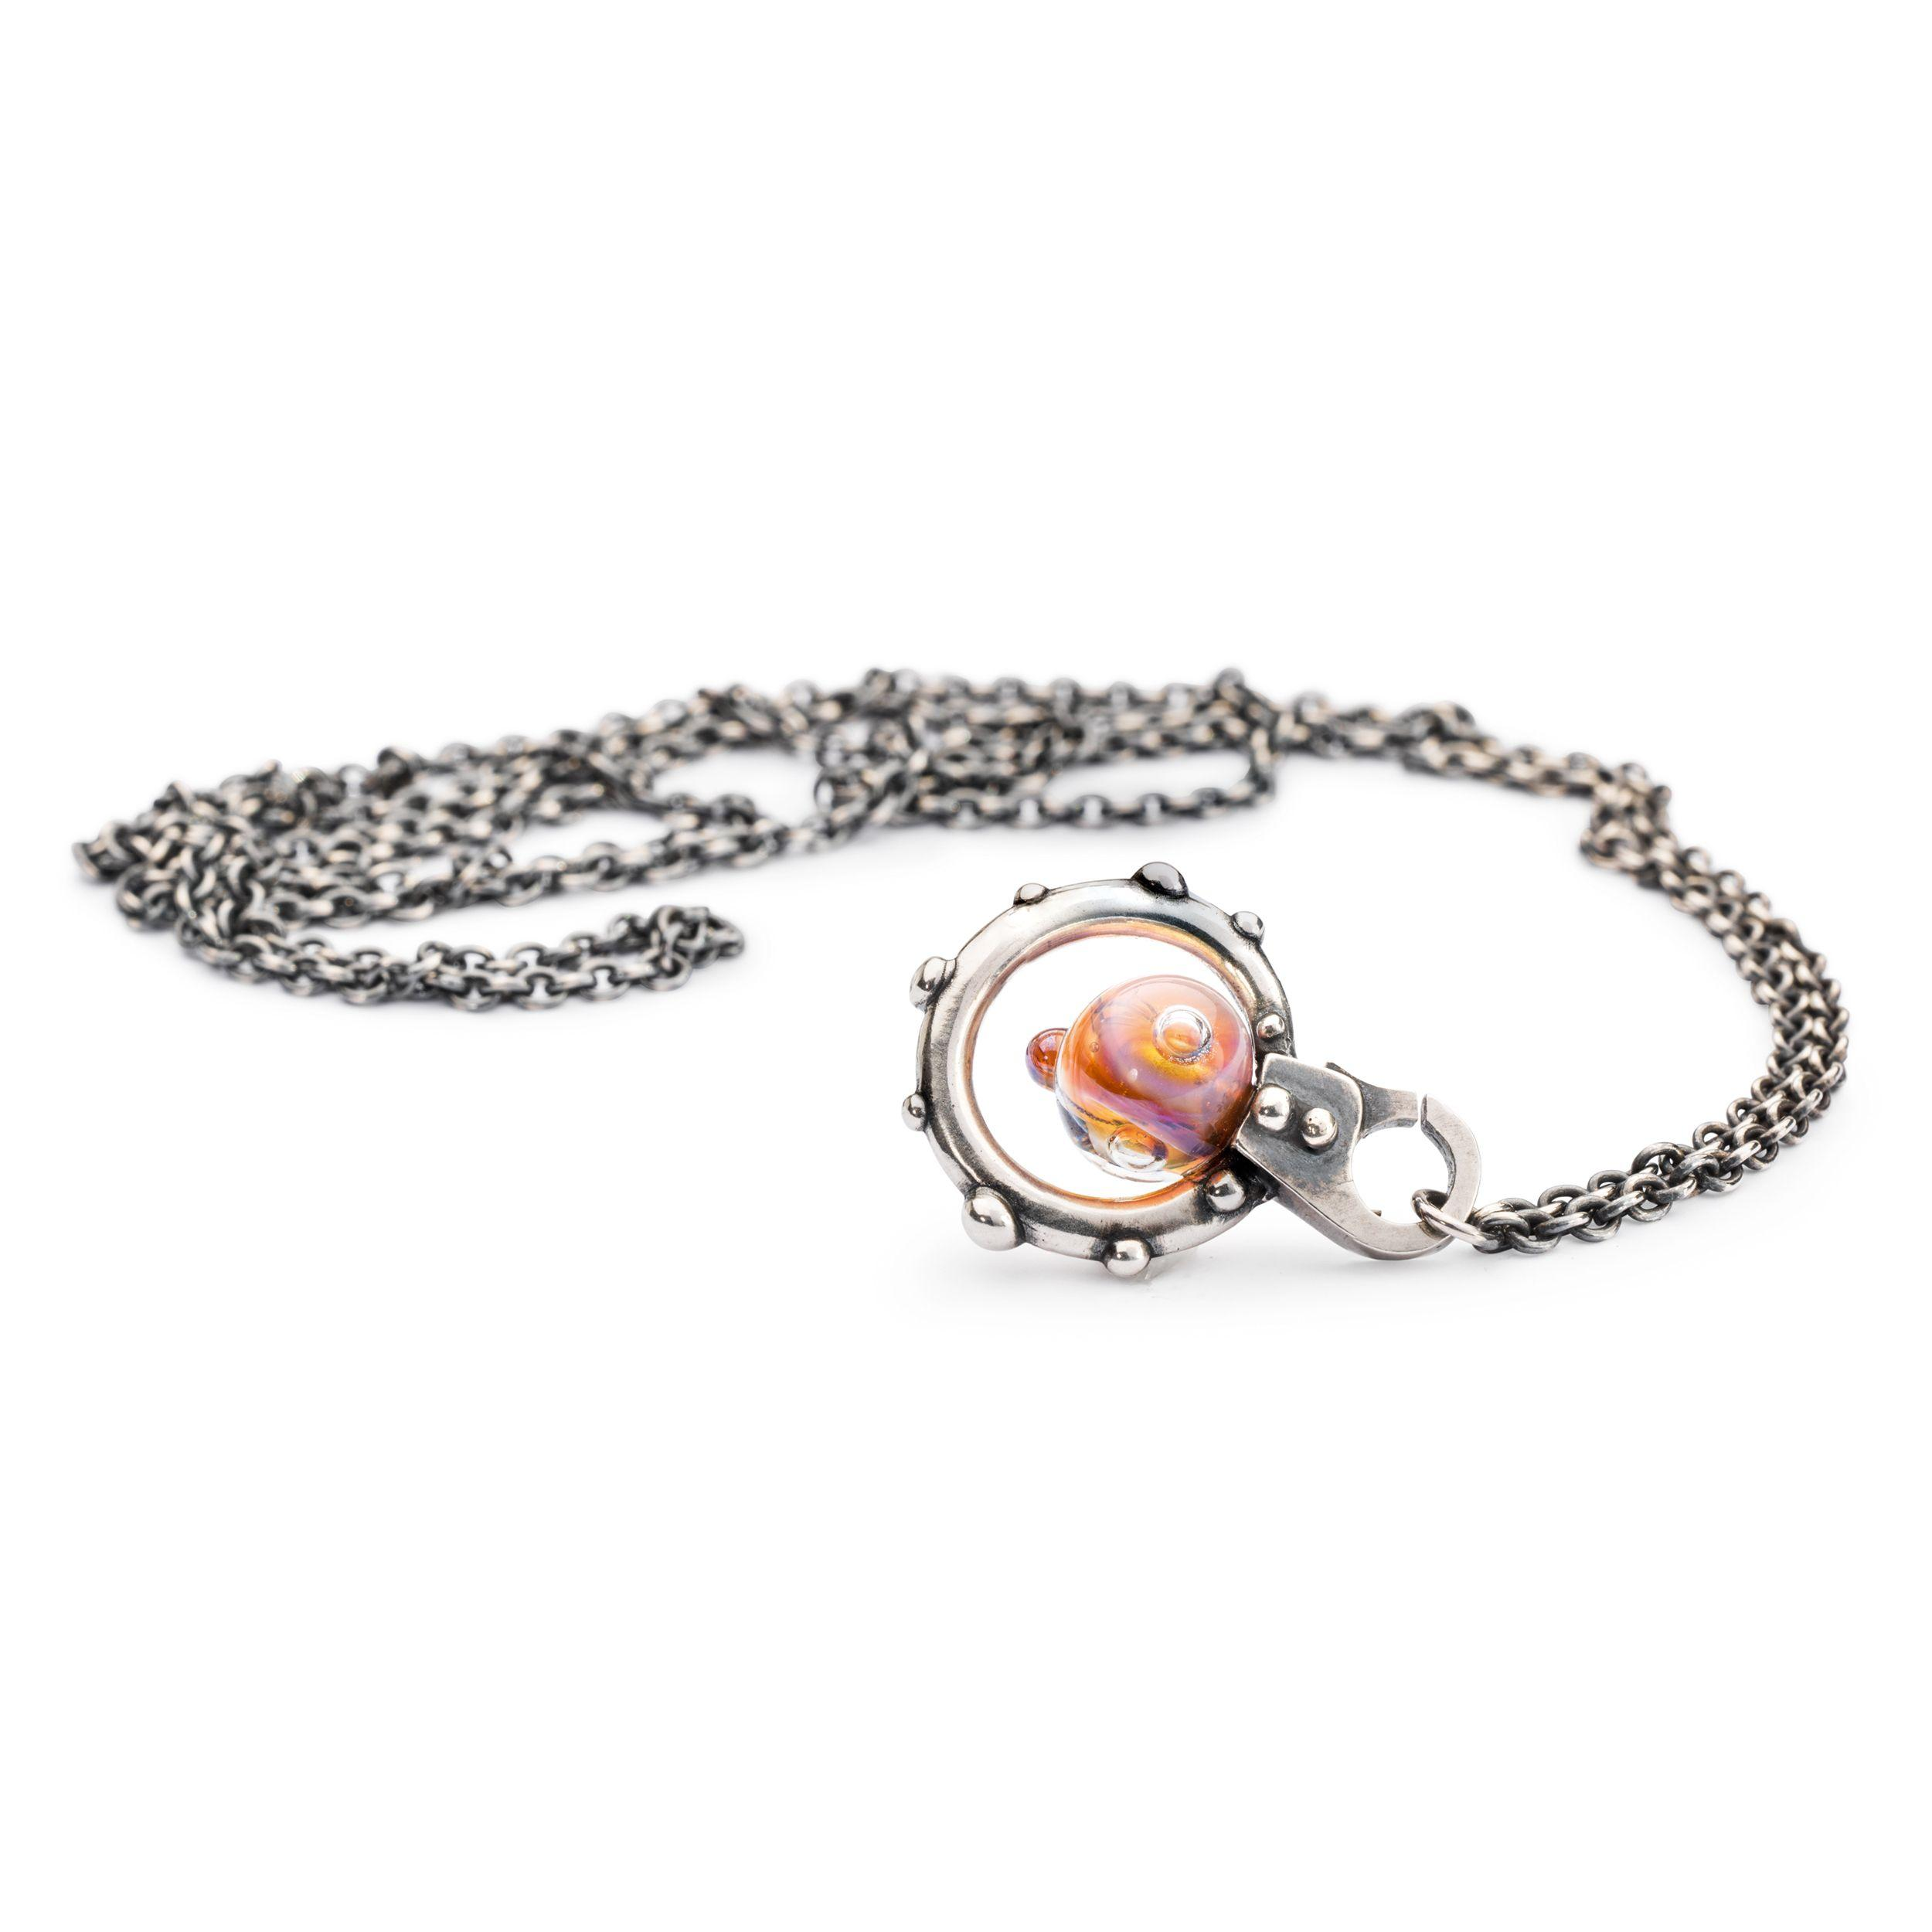 Trollbeads Beautyberries Pendant in Metallic